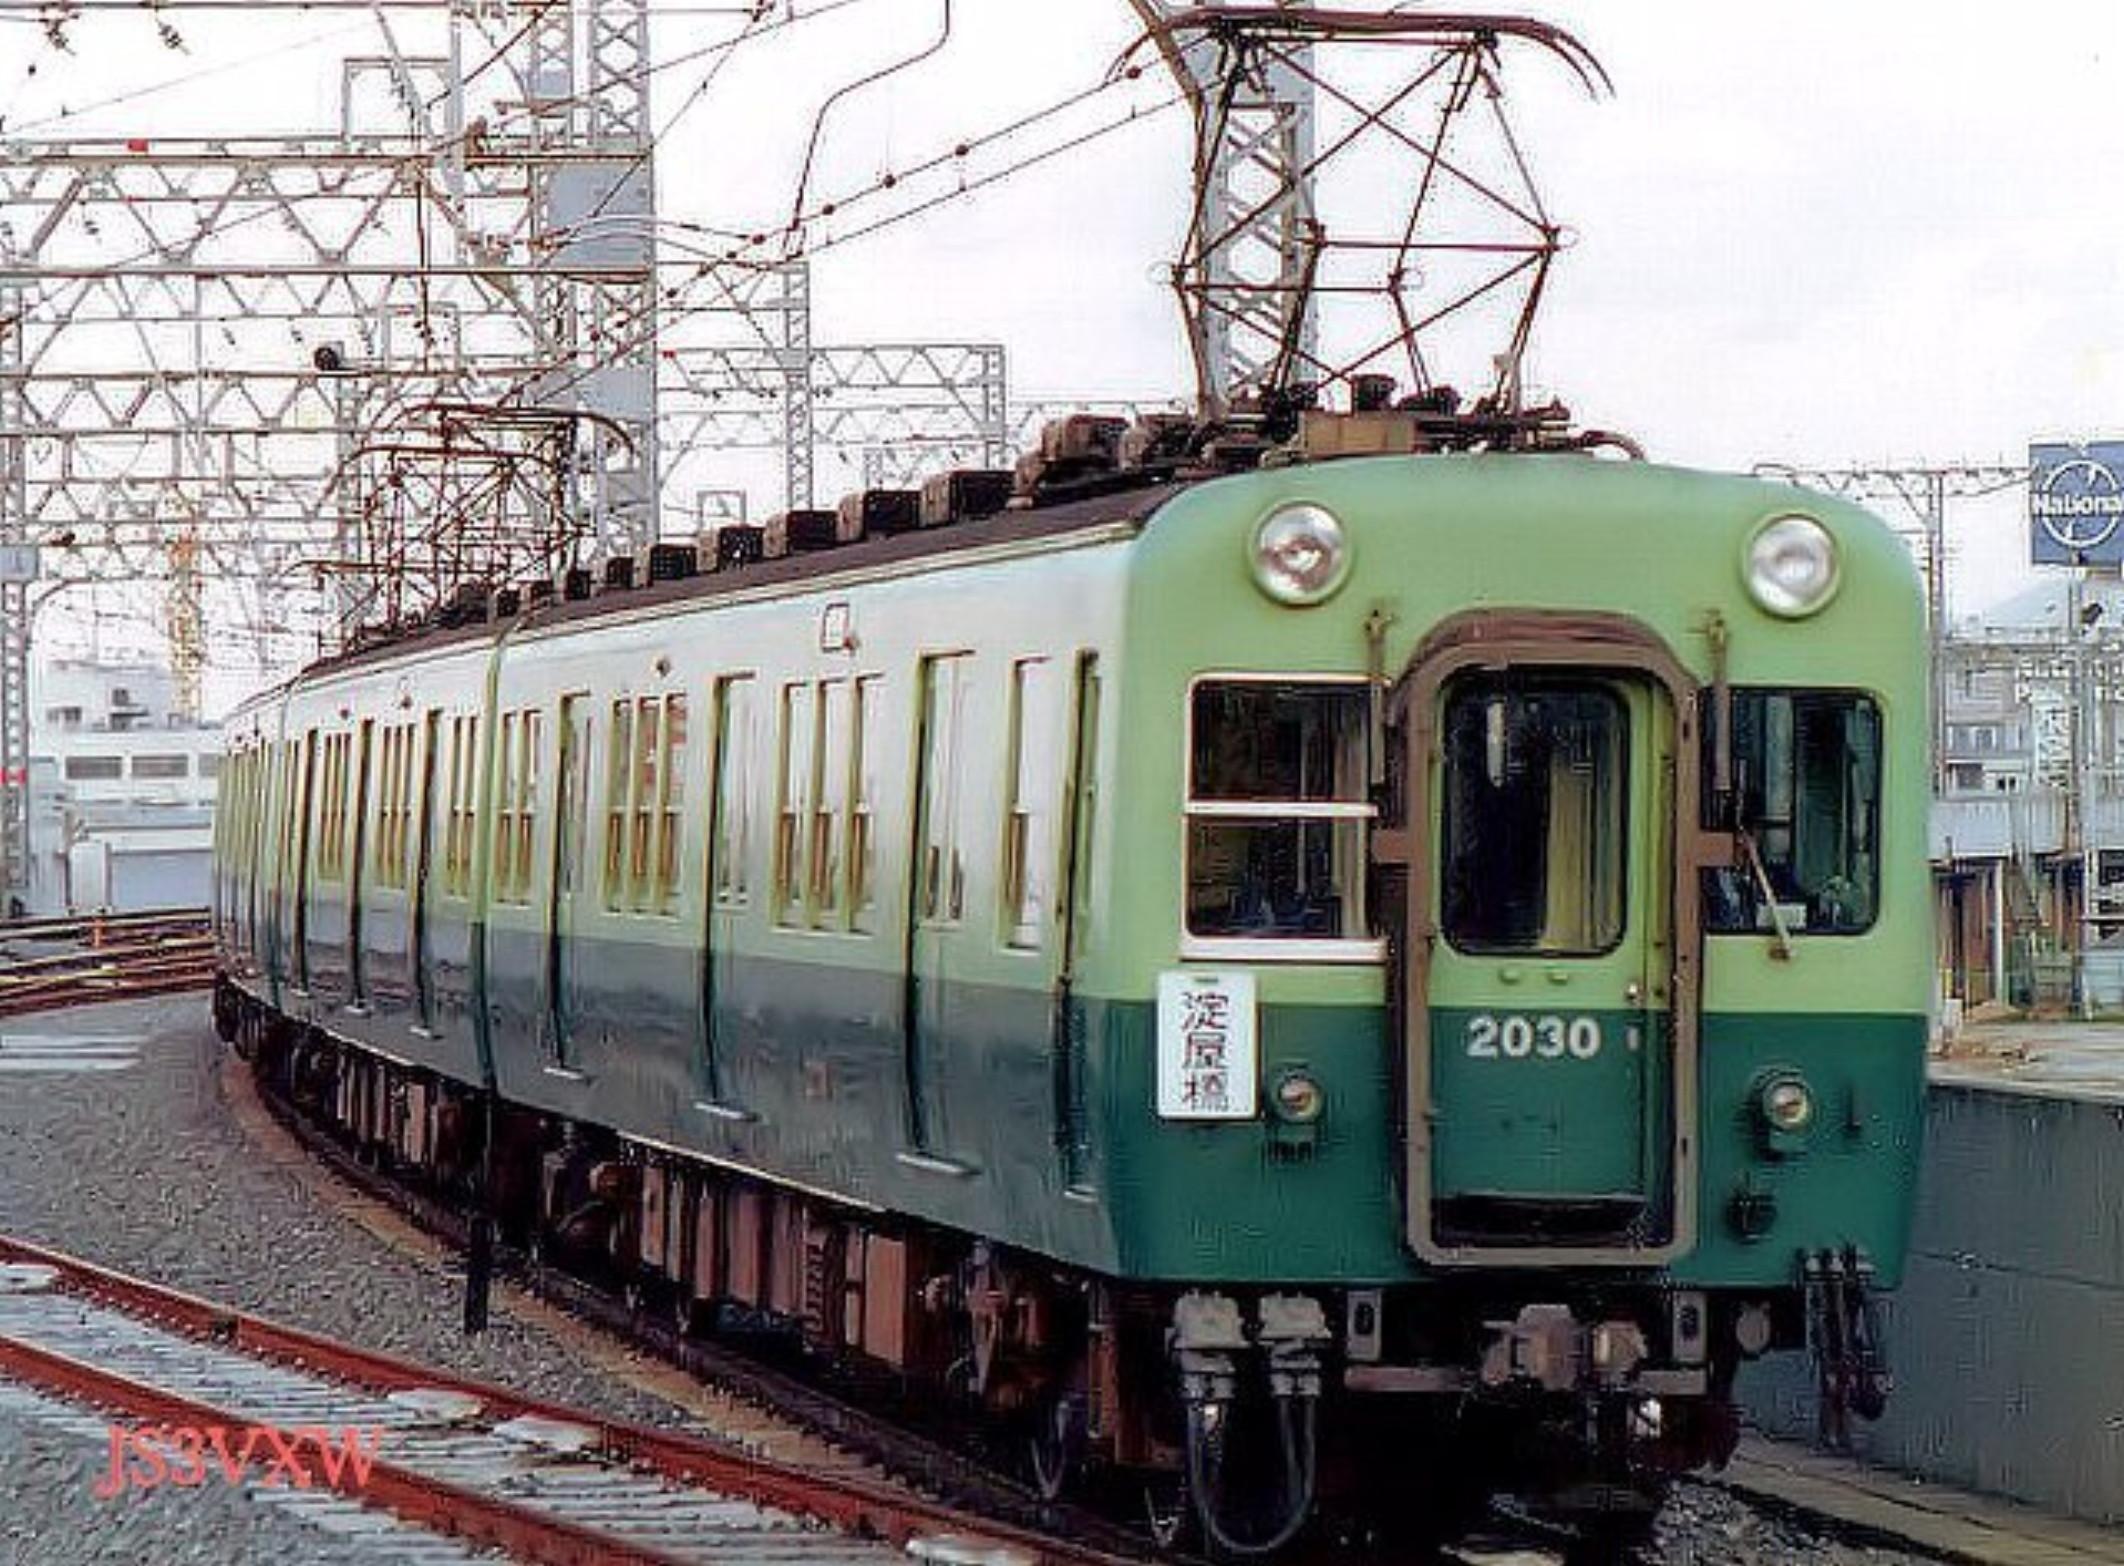 Keihan_2000_Series_02